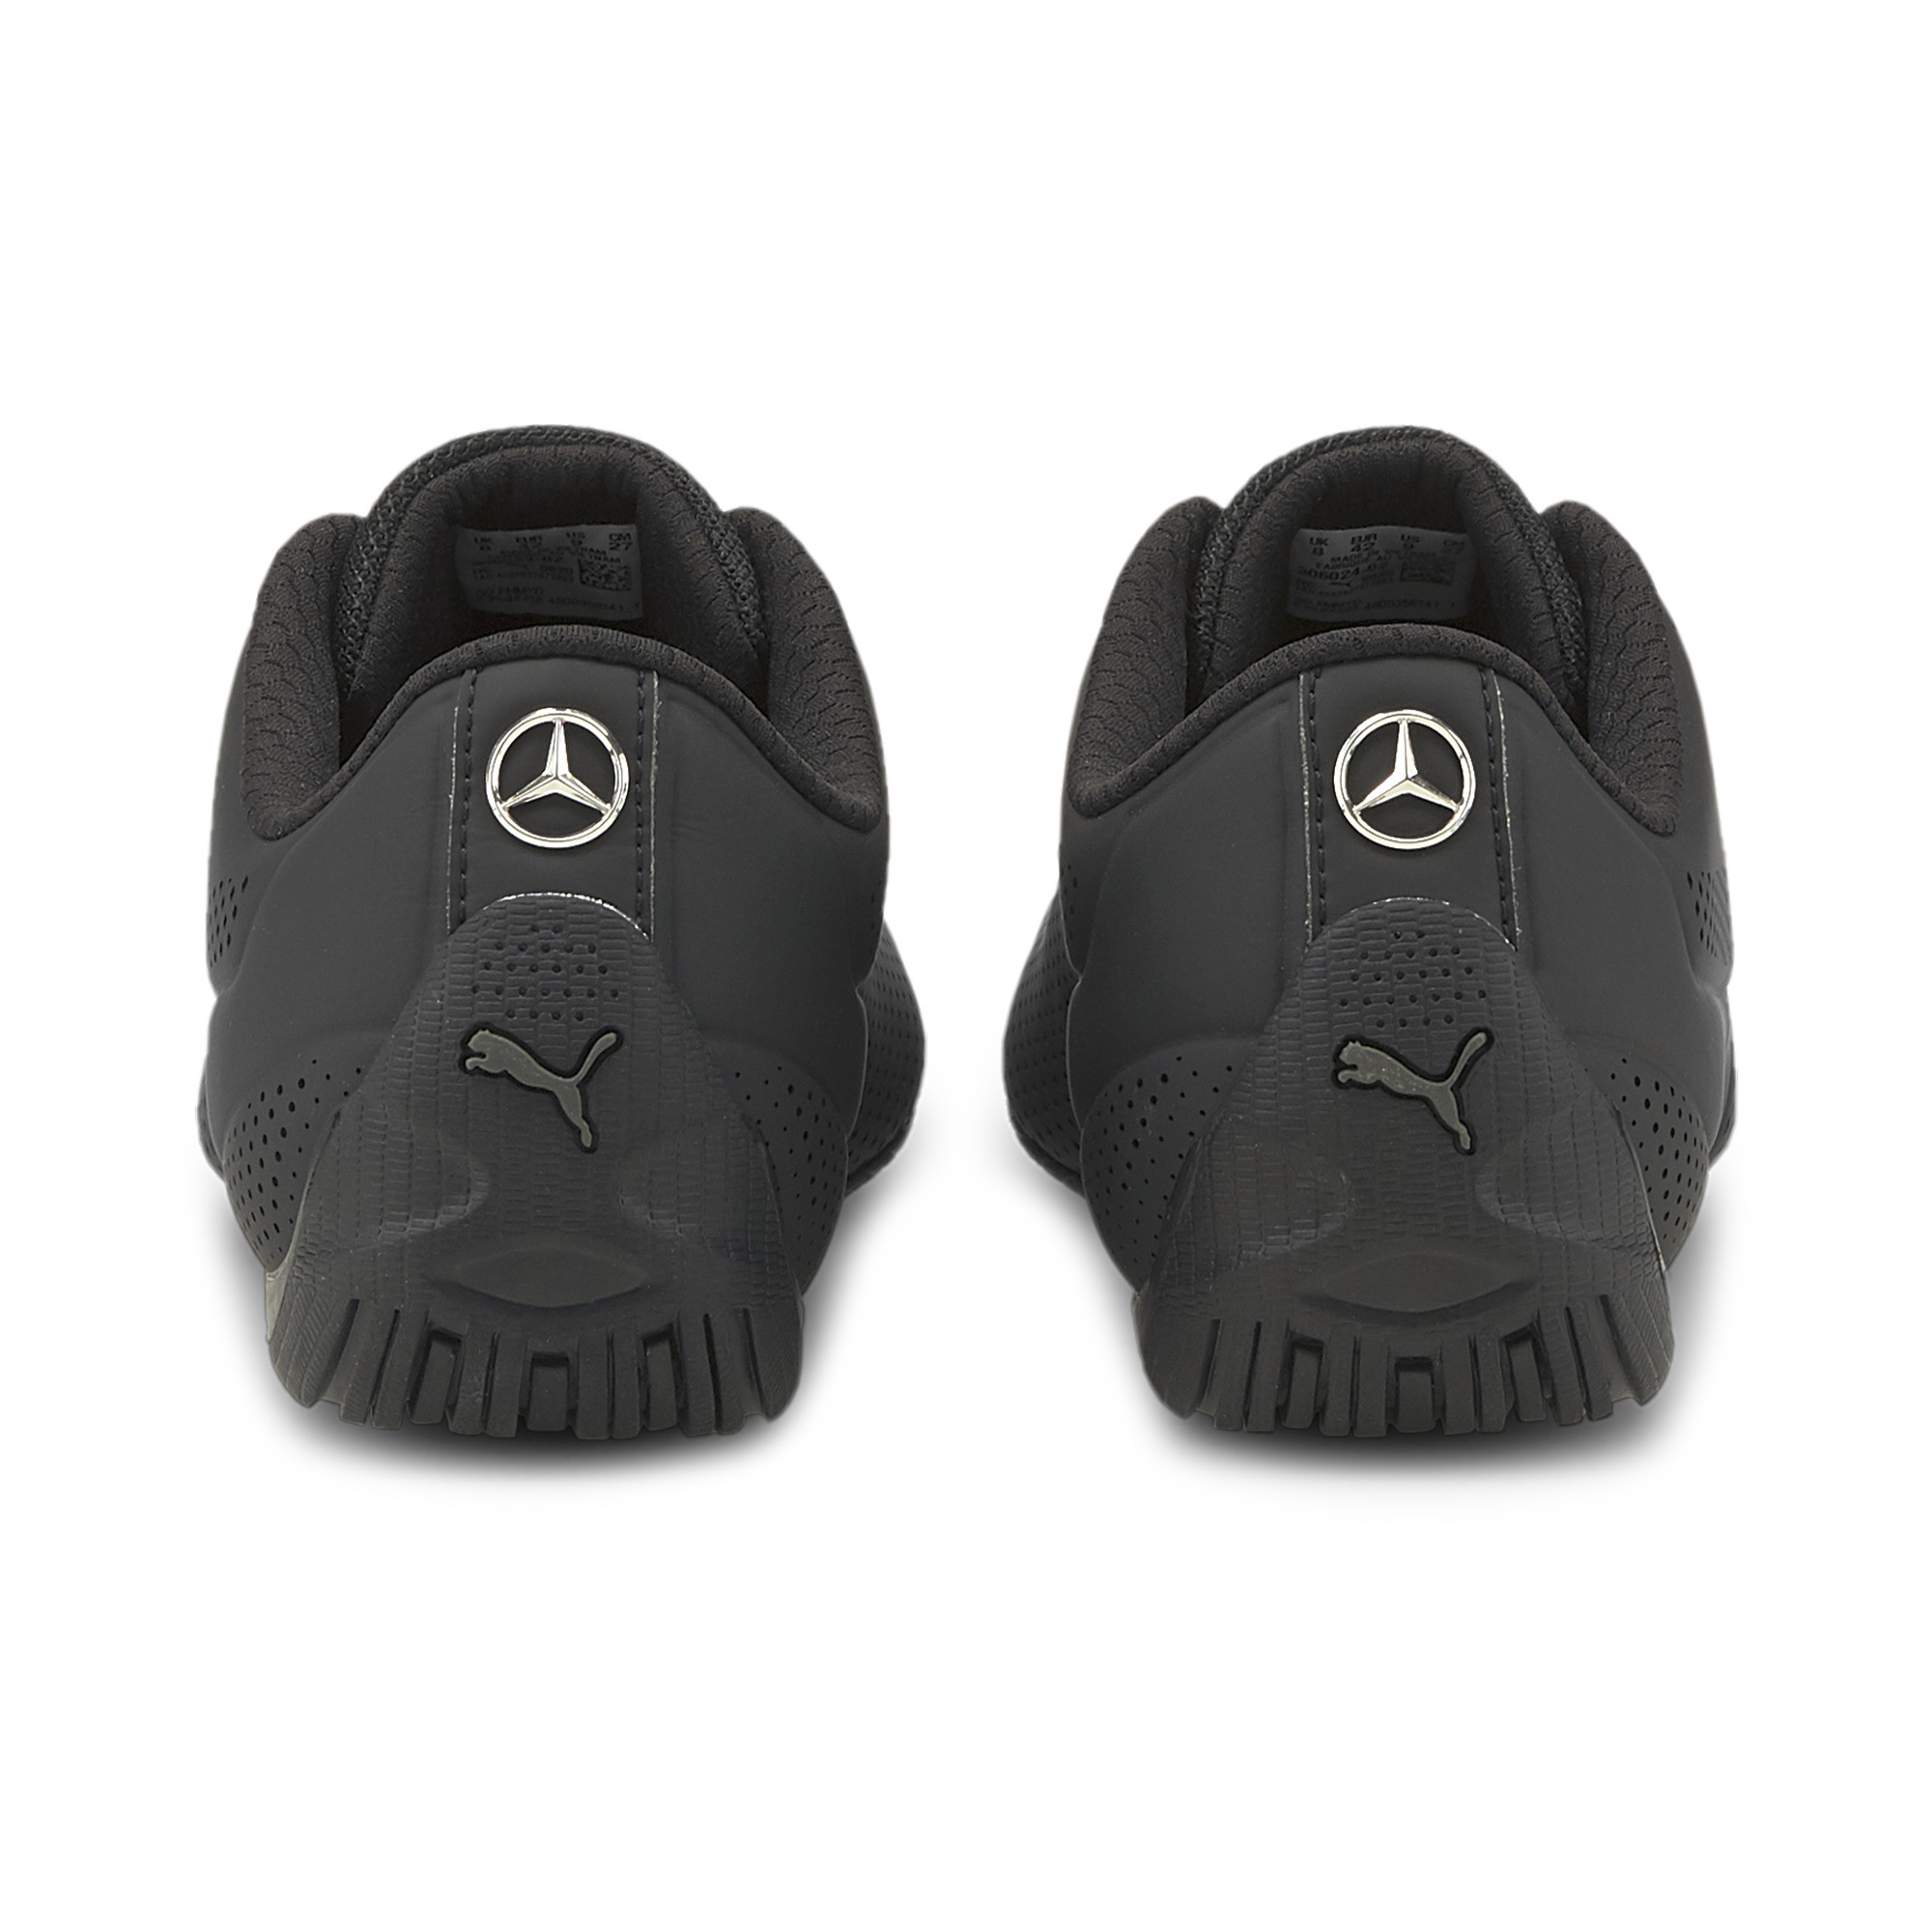 Indexbild 10 - PUMA MERCEDES AMG PETRONAS Drift Cat Ultra Sneaker Unisex Schuhe Neu